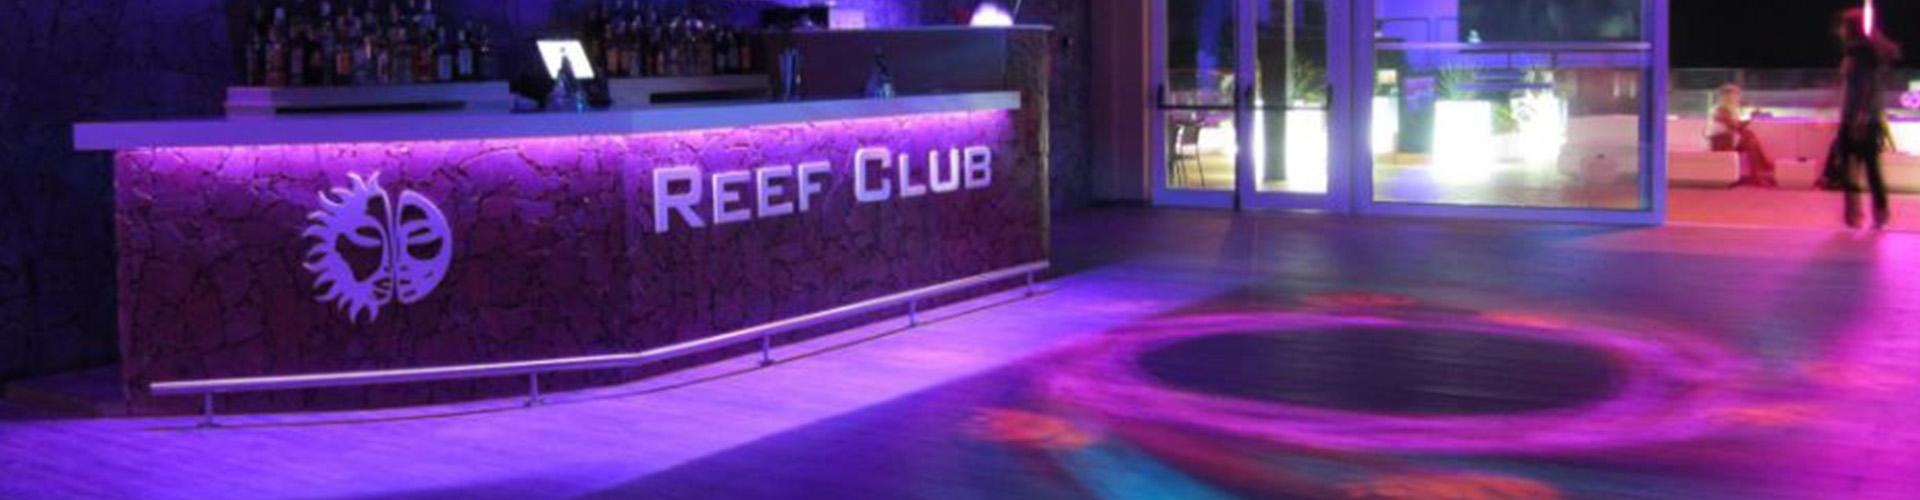 Reef Club Casino Aktionscode